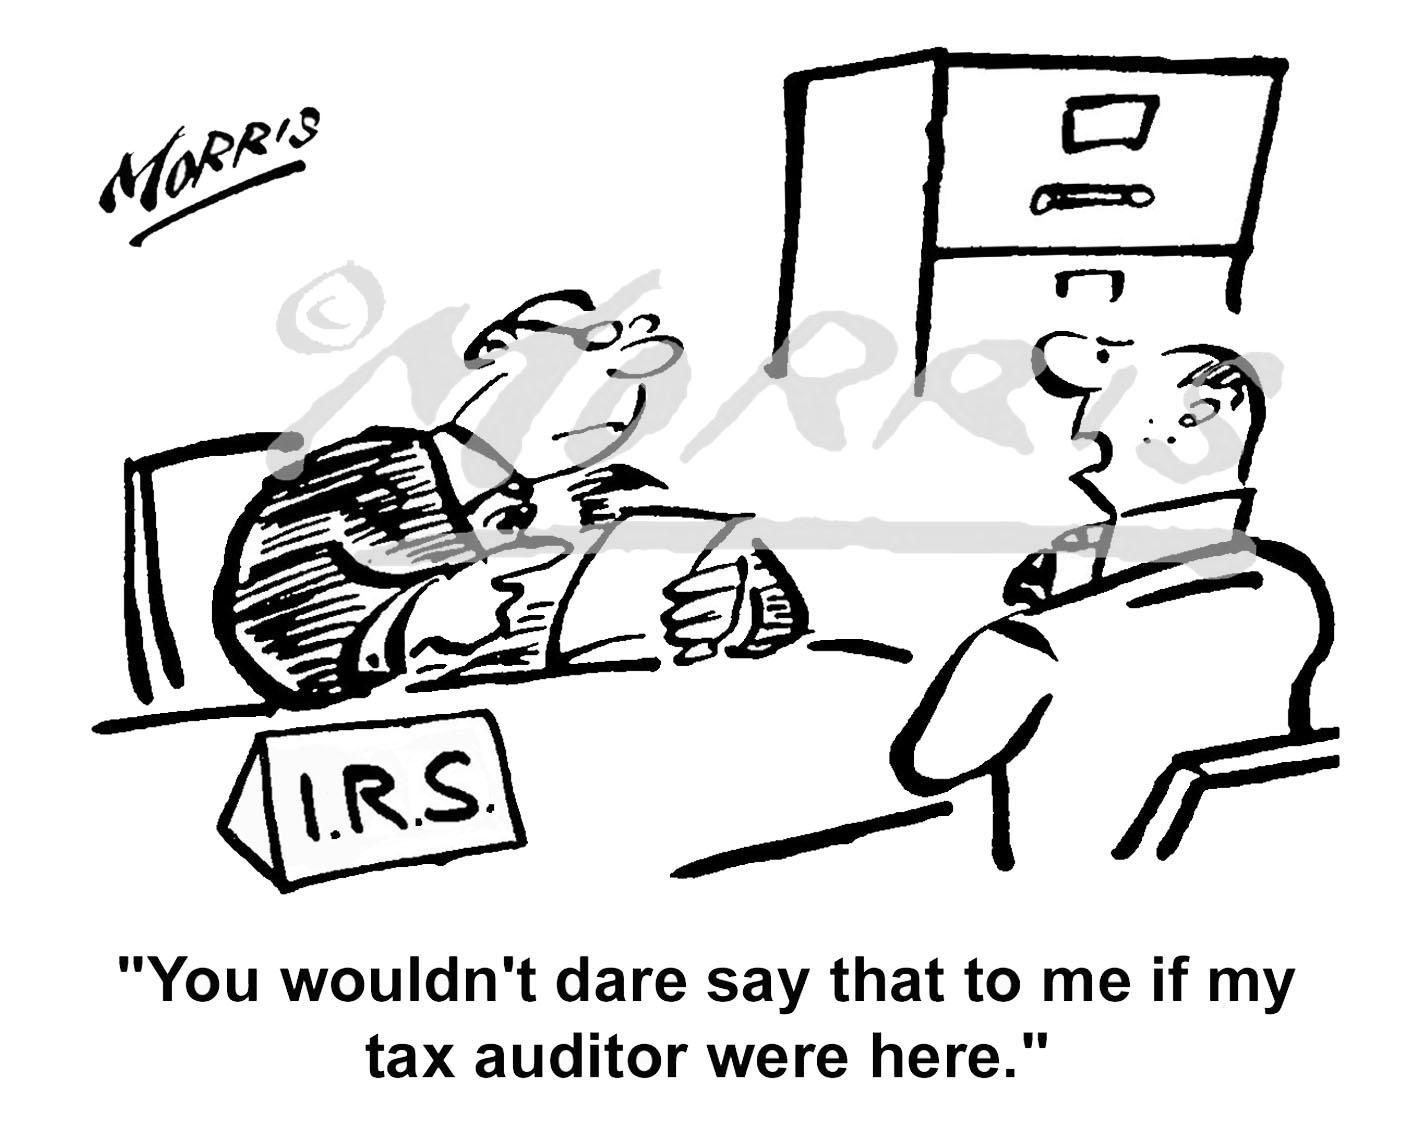 Tax auditor cartoon – Ref: 1740bwus